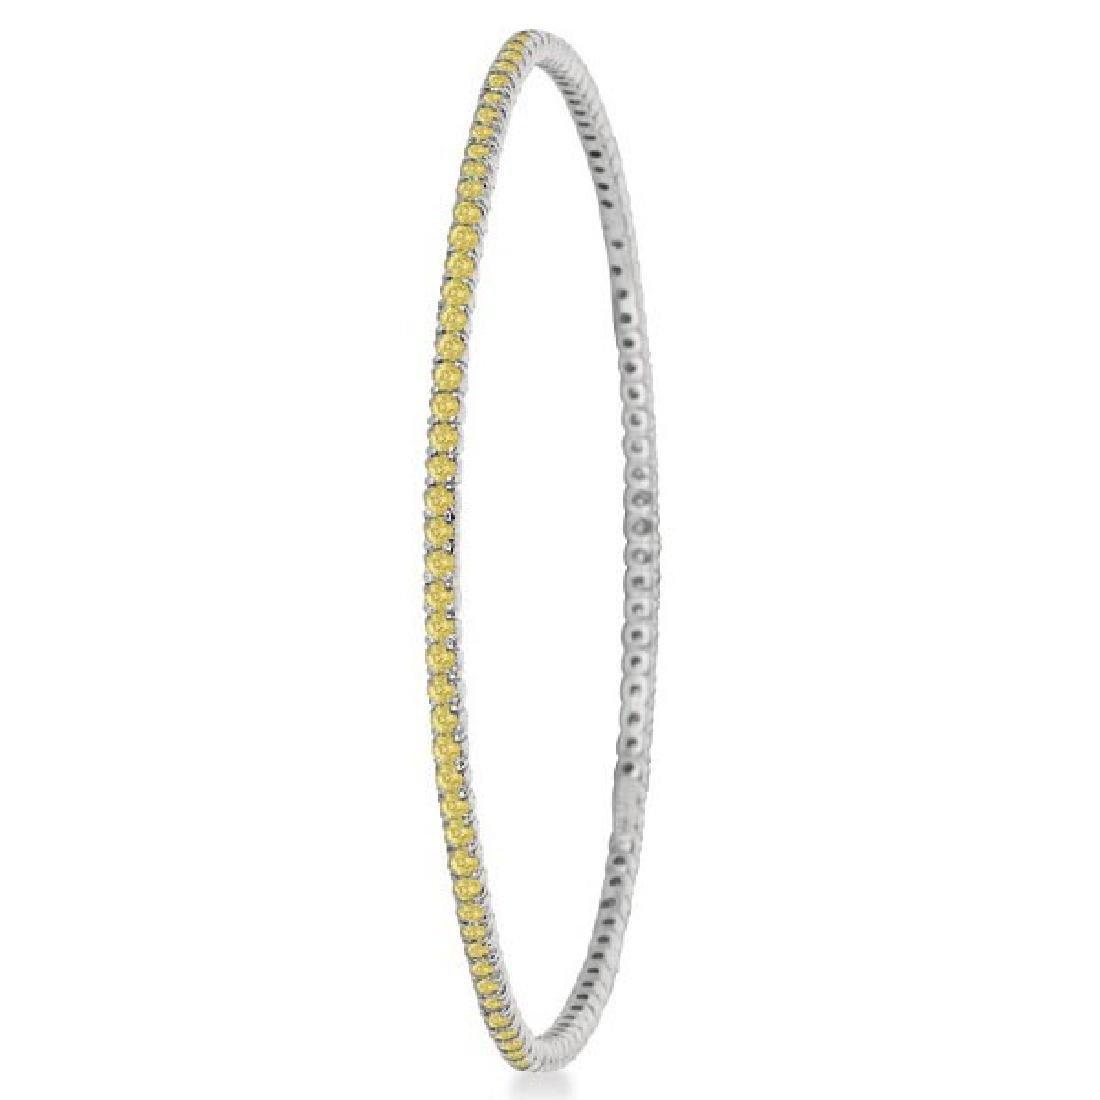 Fancy Yellow Diamond Eternity Bangle Bracelet 14k White